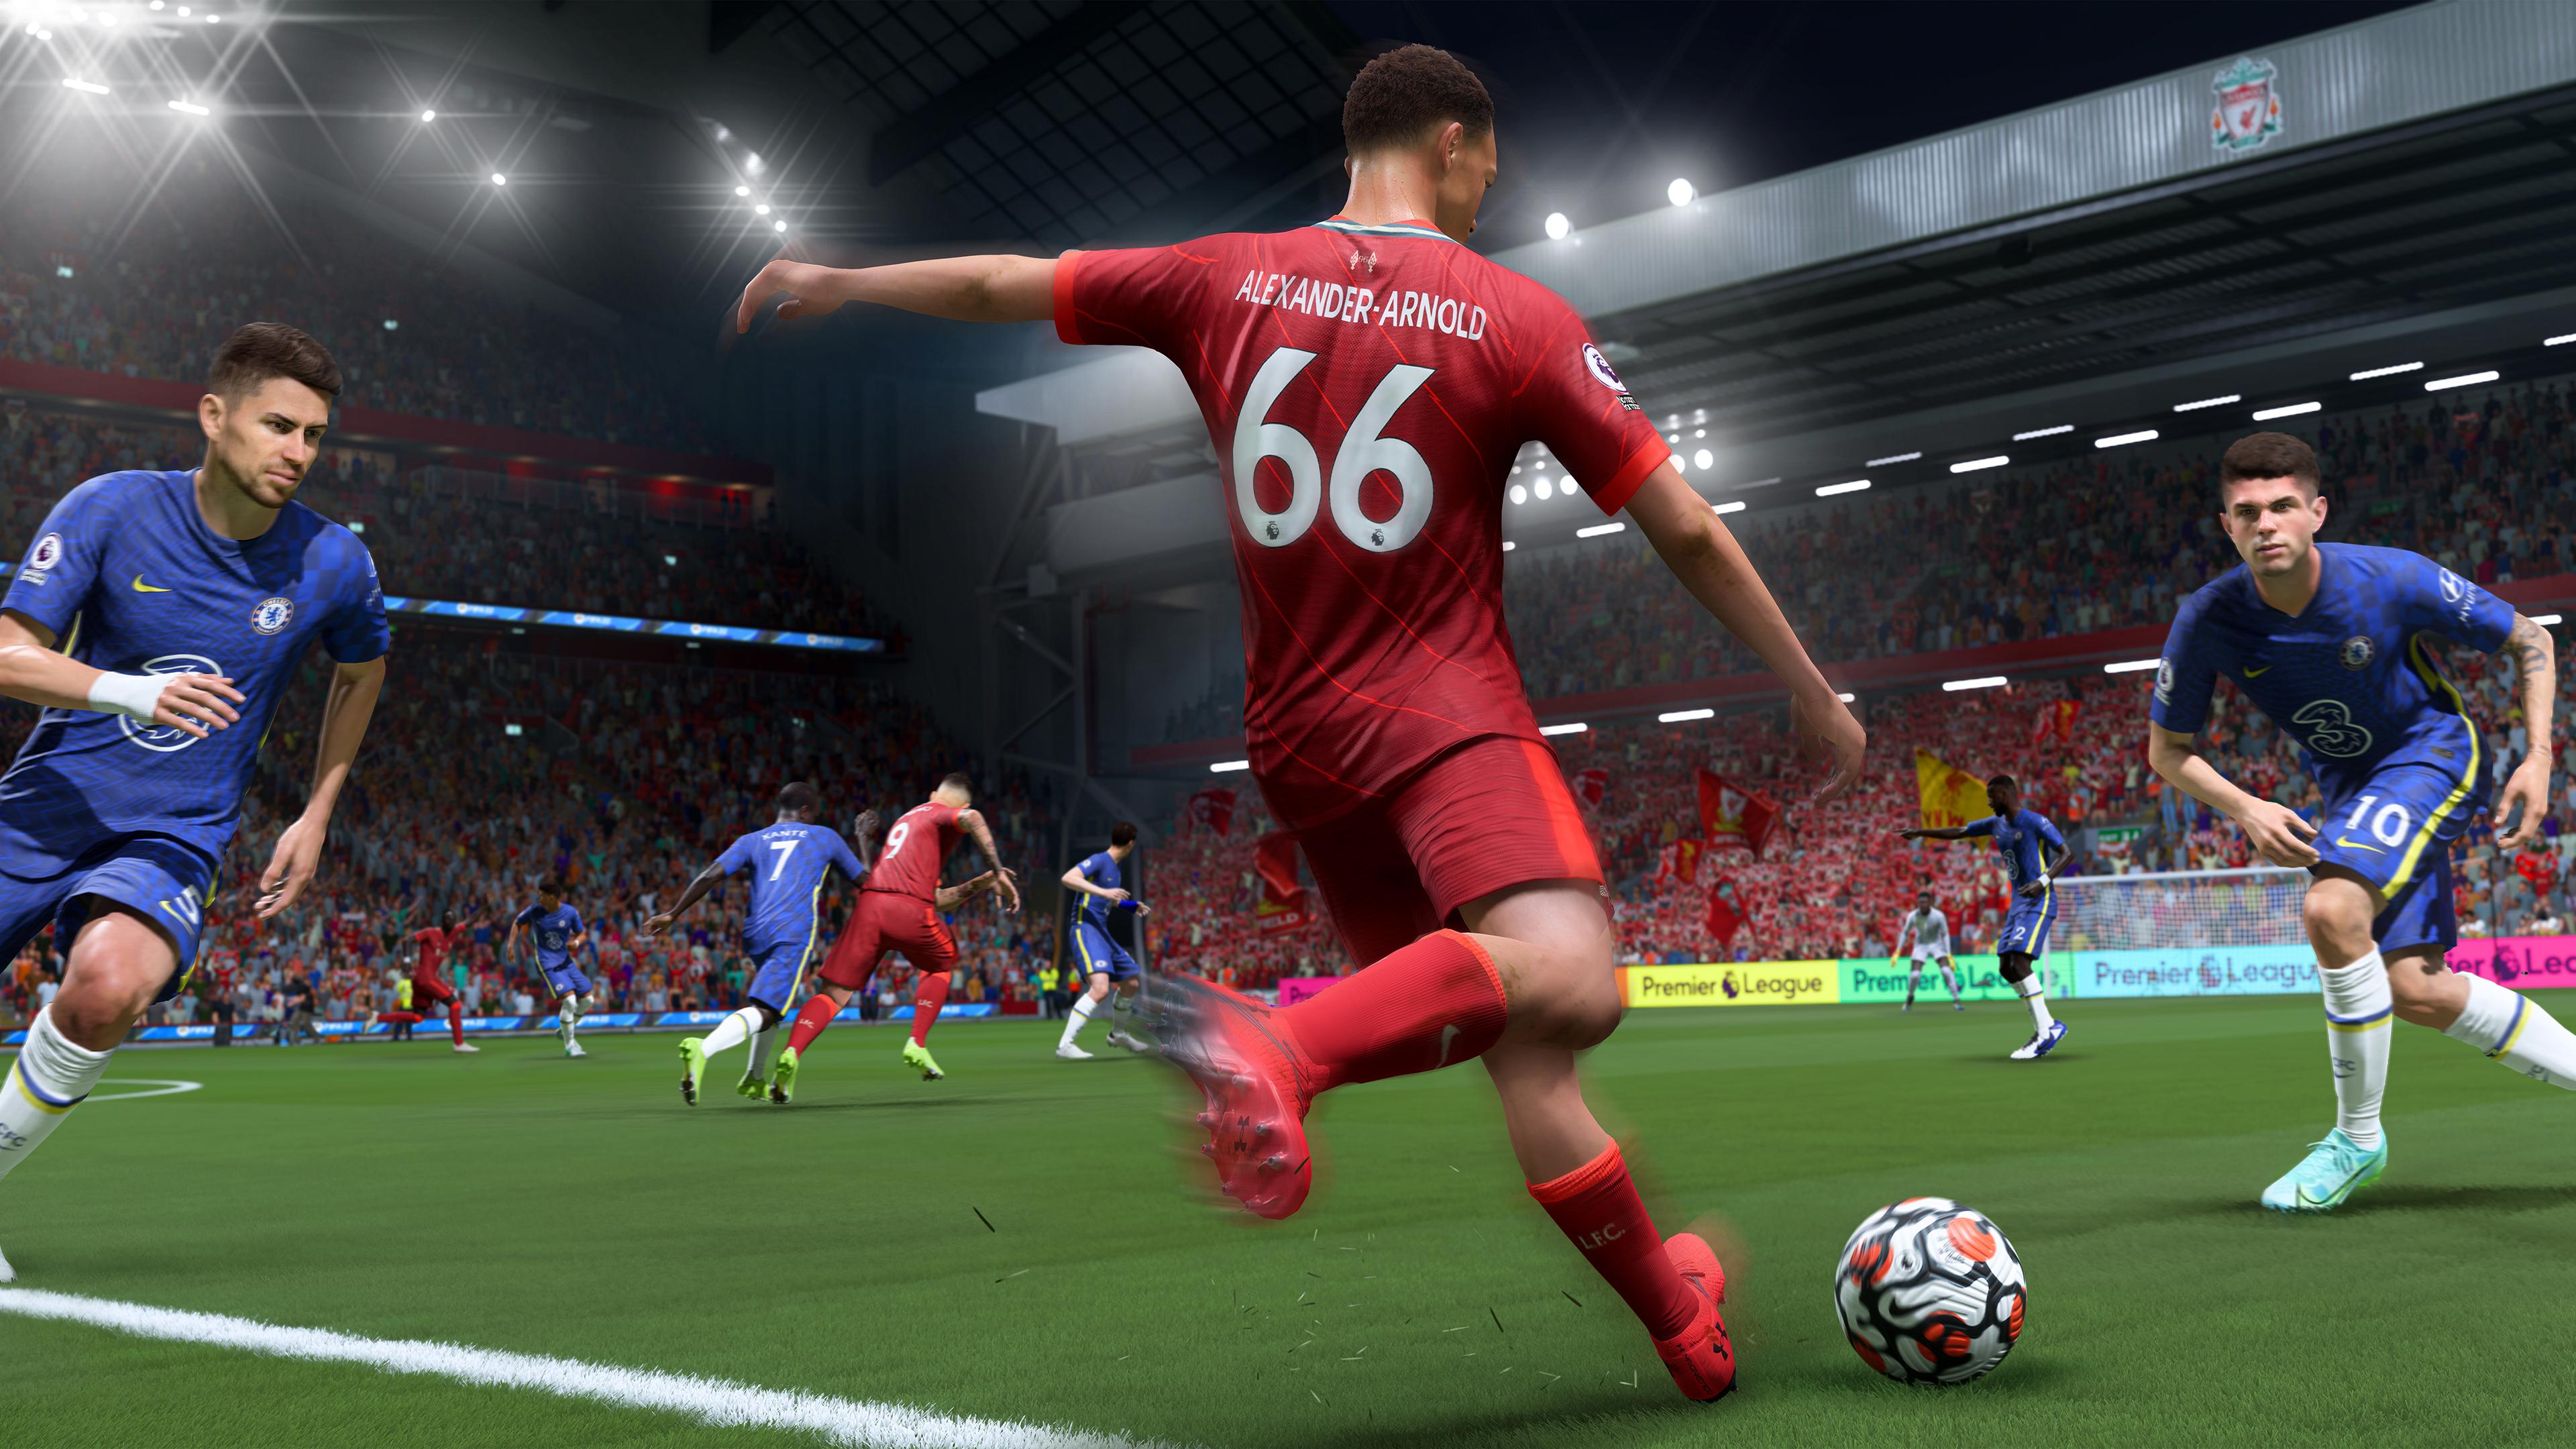 Скриншот №2 к FIFA 22 издание Ultimate PS4 и PS5